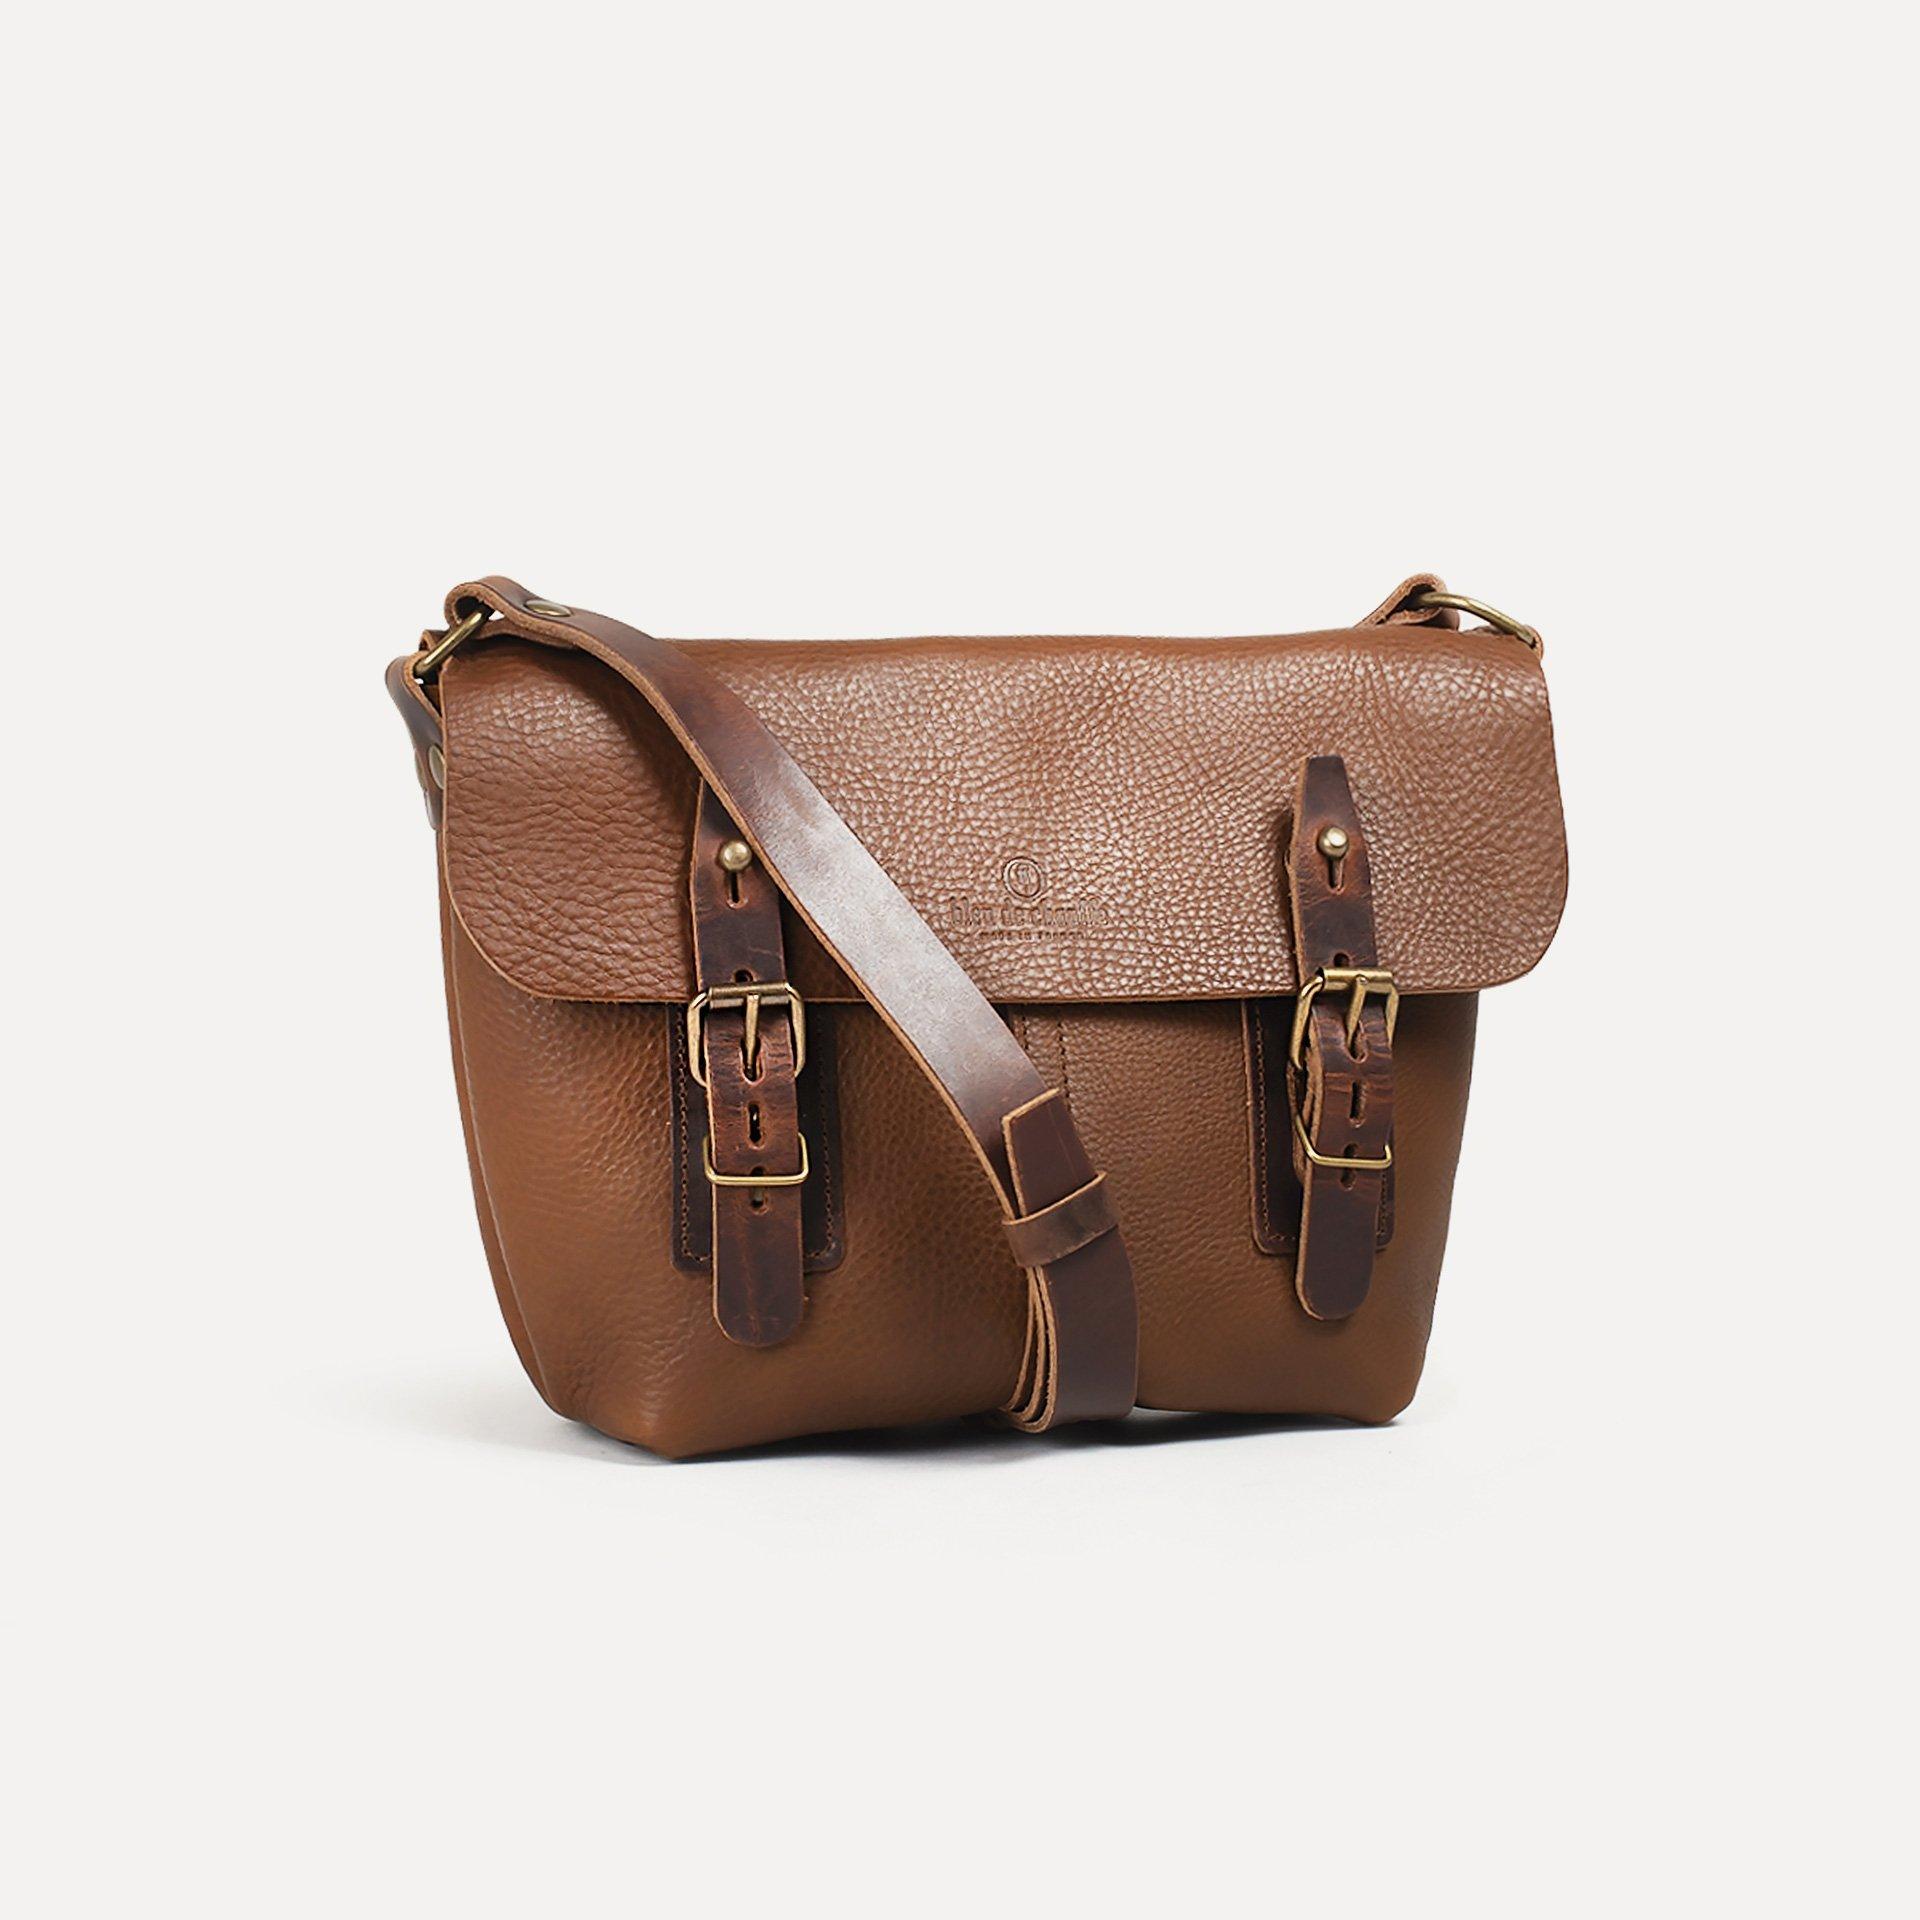 Louis Satchel bag - Cuba Libre (image n°2)